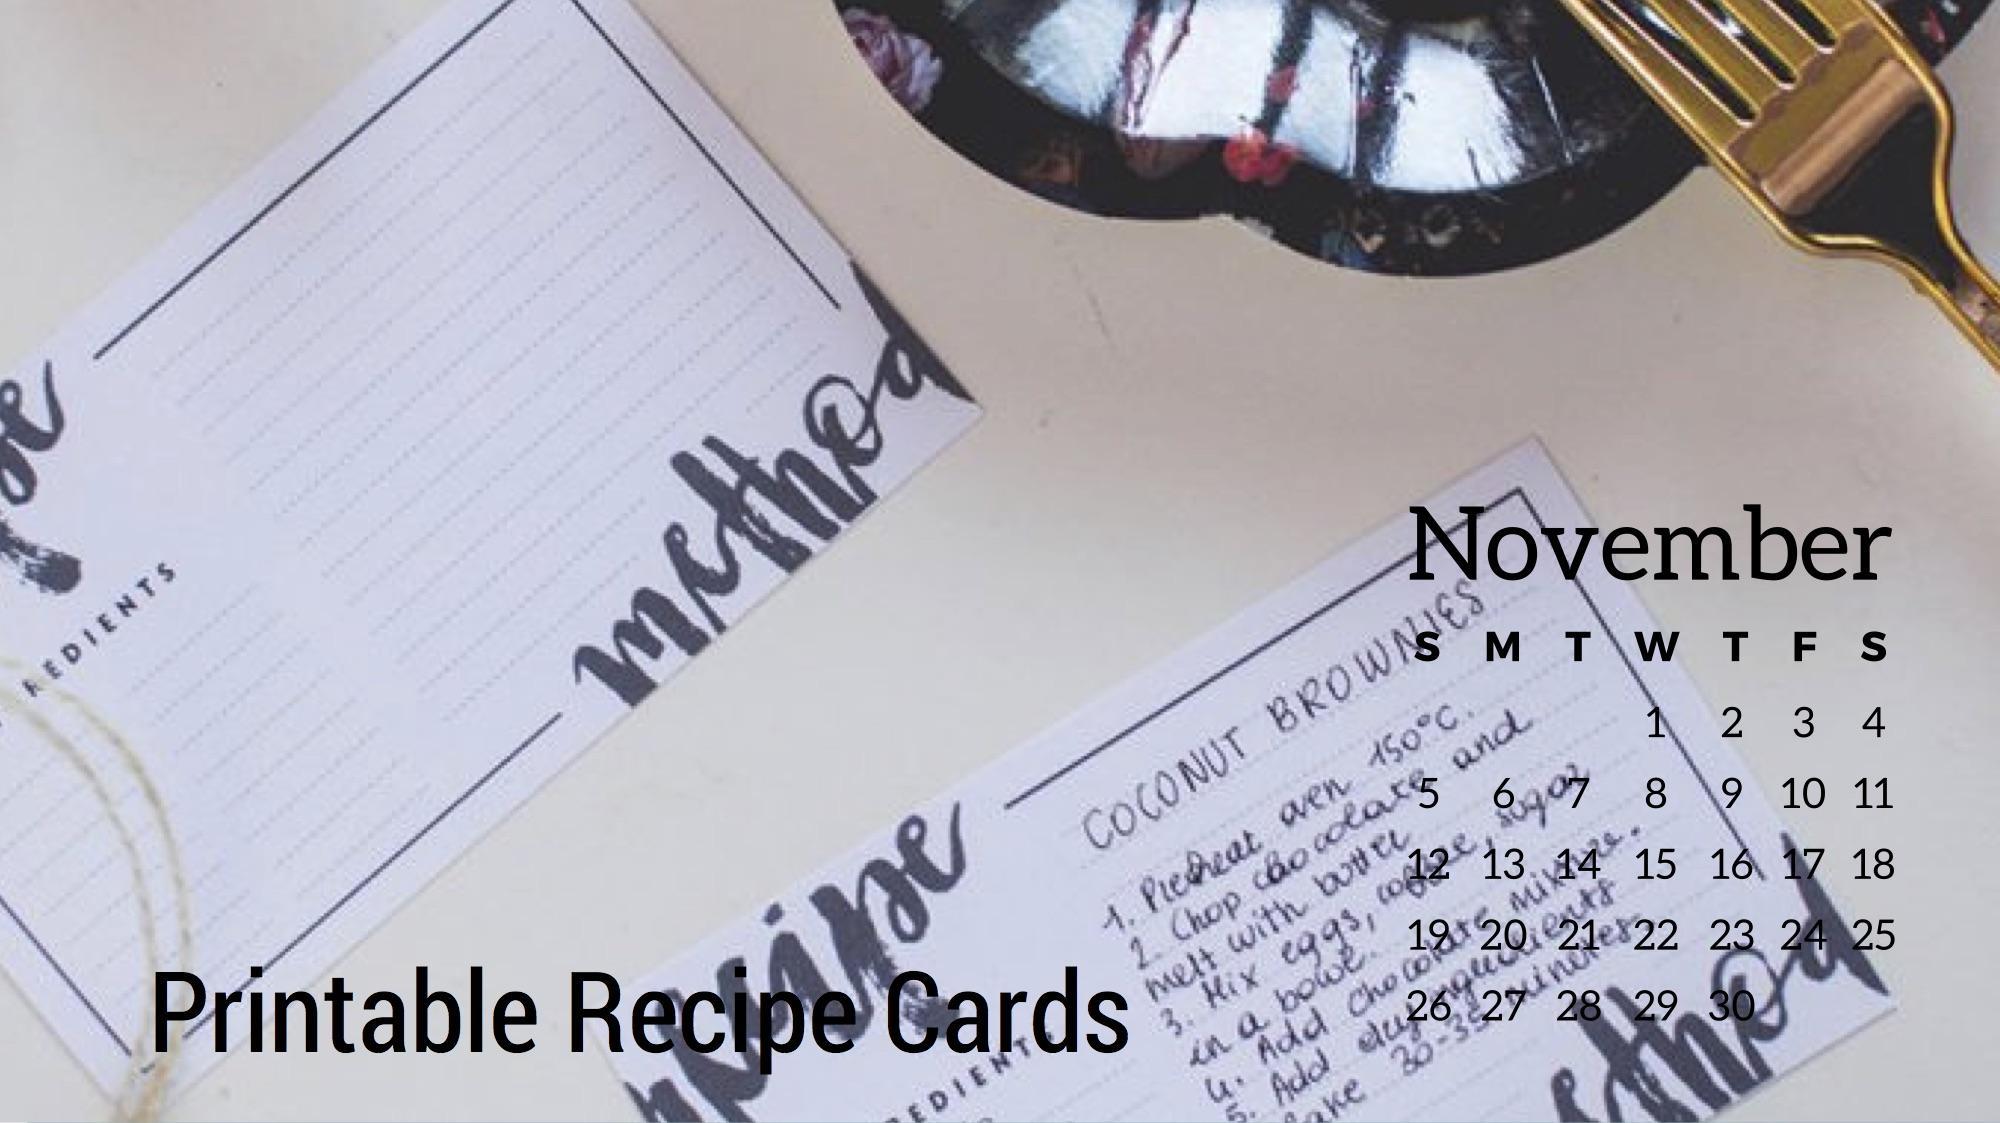 11-november-2017-printable-craft-calendar-by-pop-shop-america